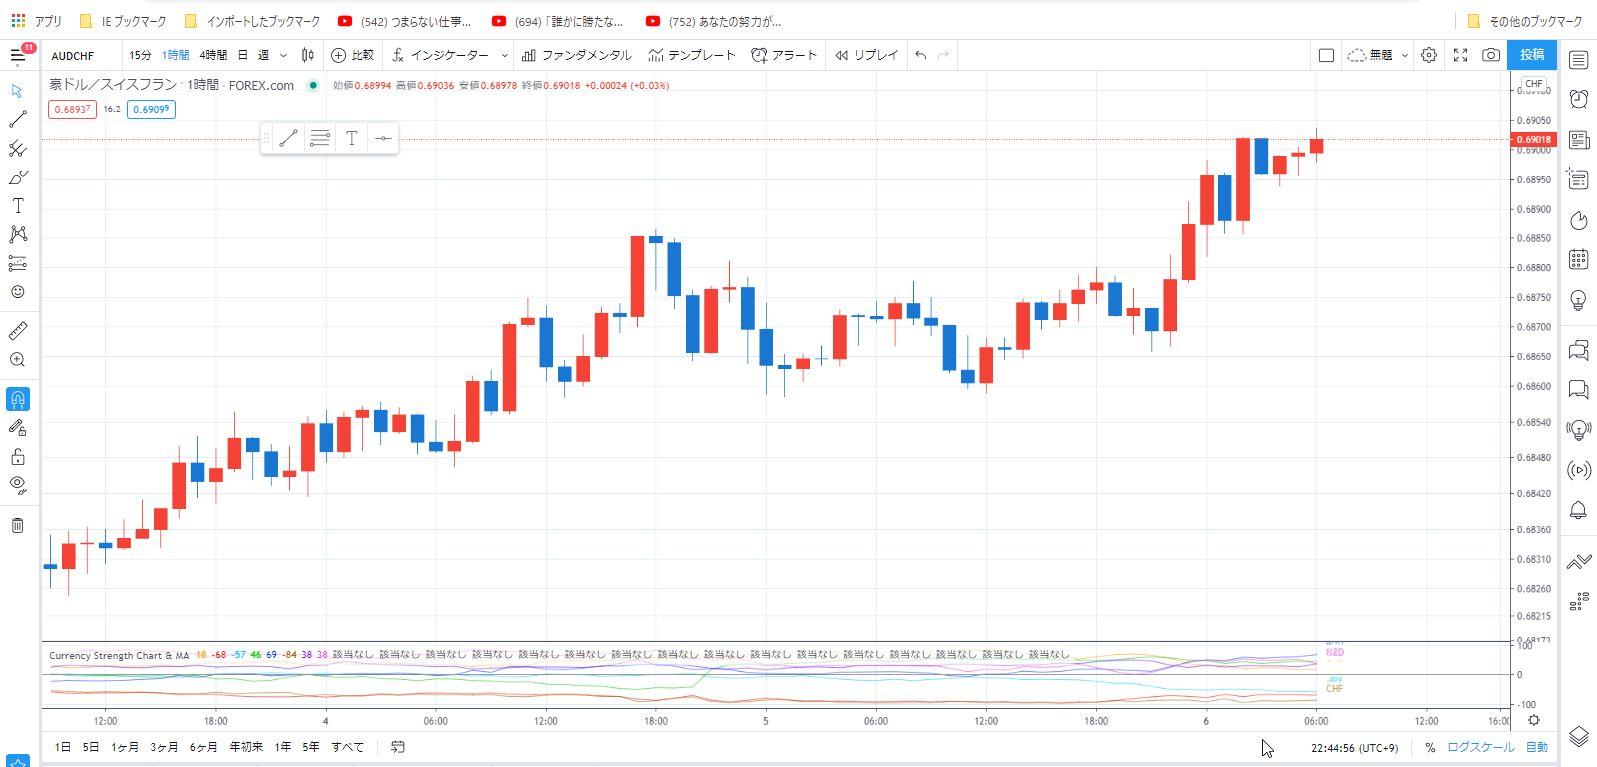 Tradingview 豪ドル/スイスフラン